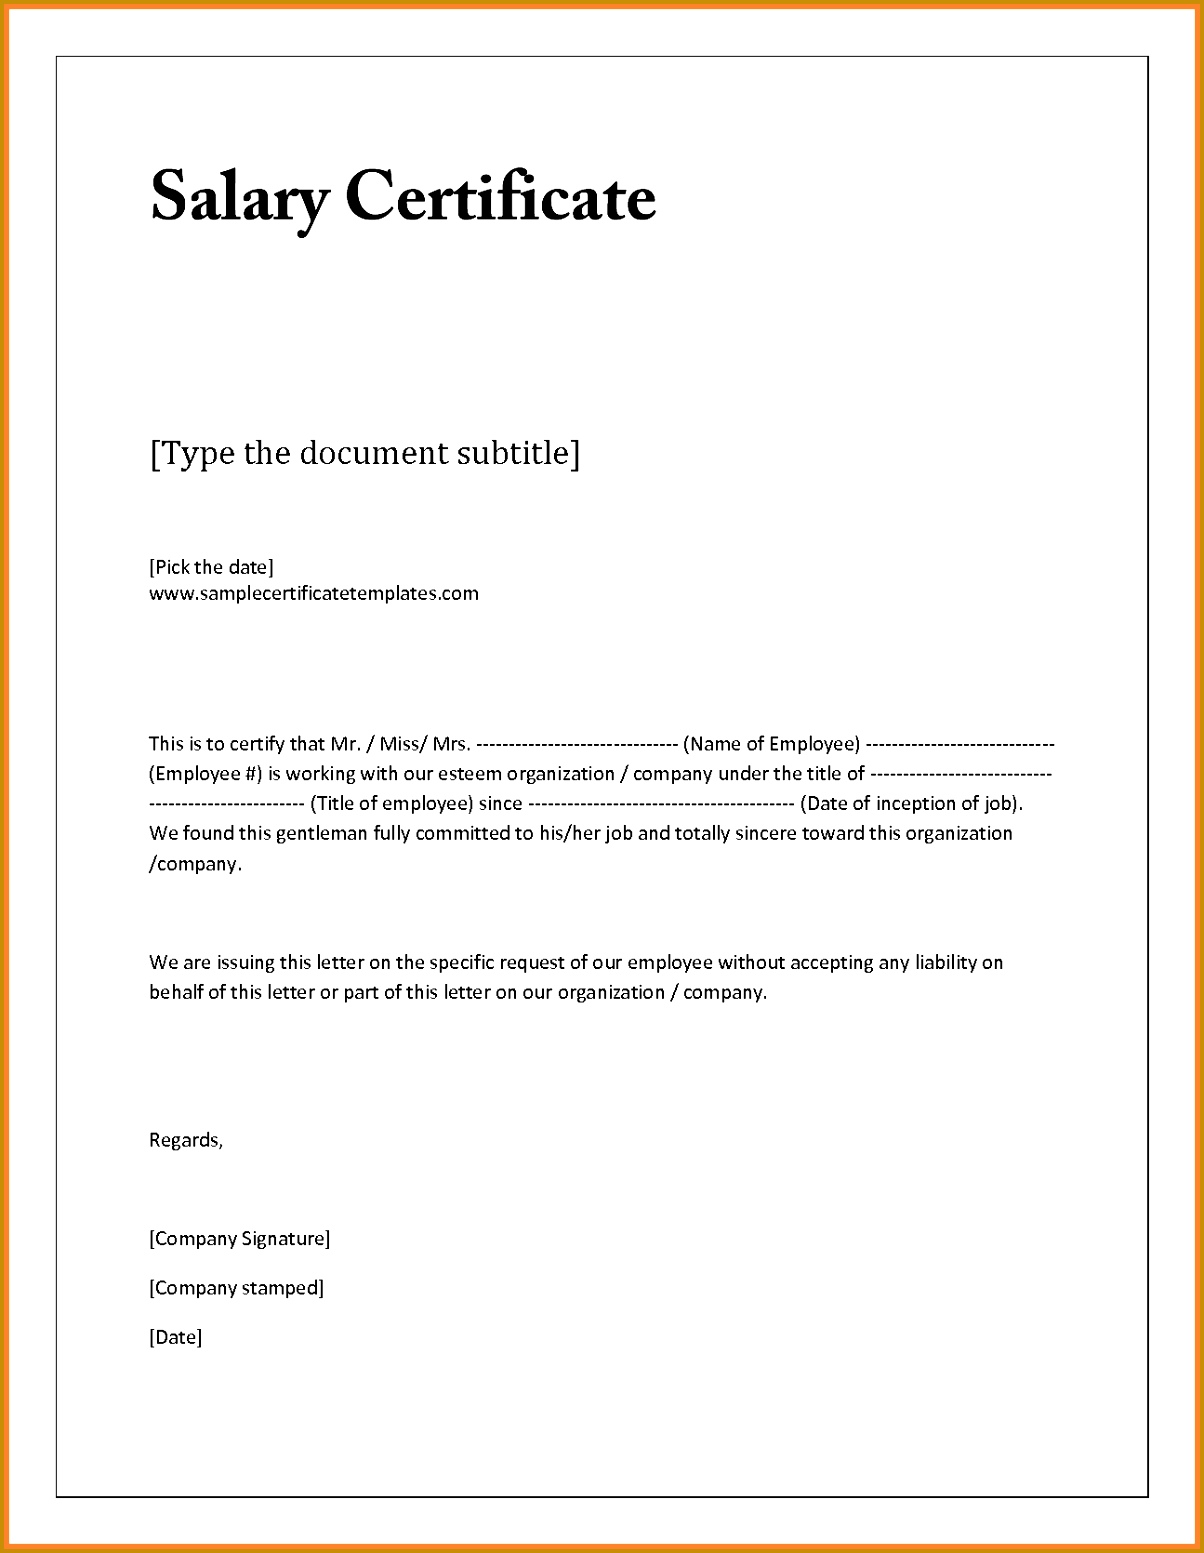 salary confirmation 12041553